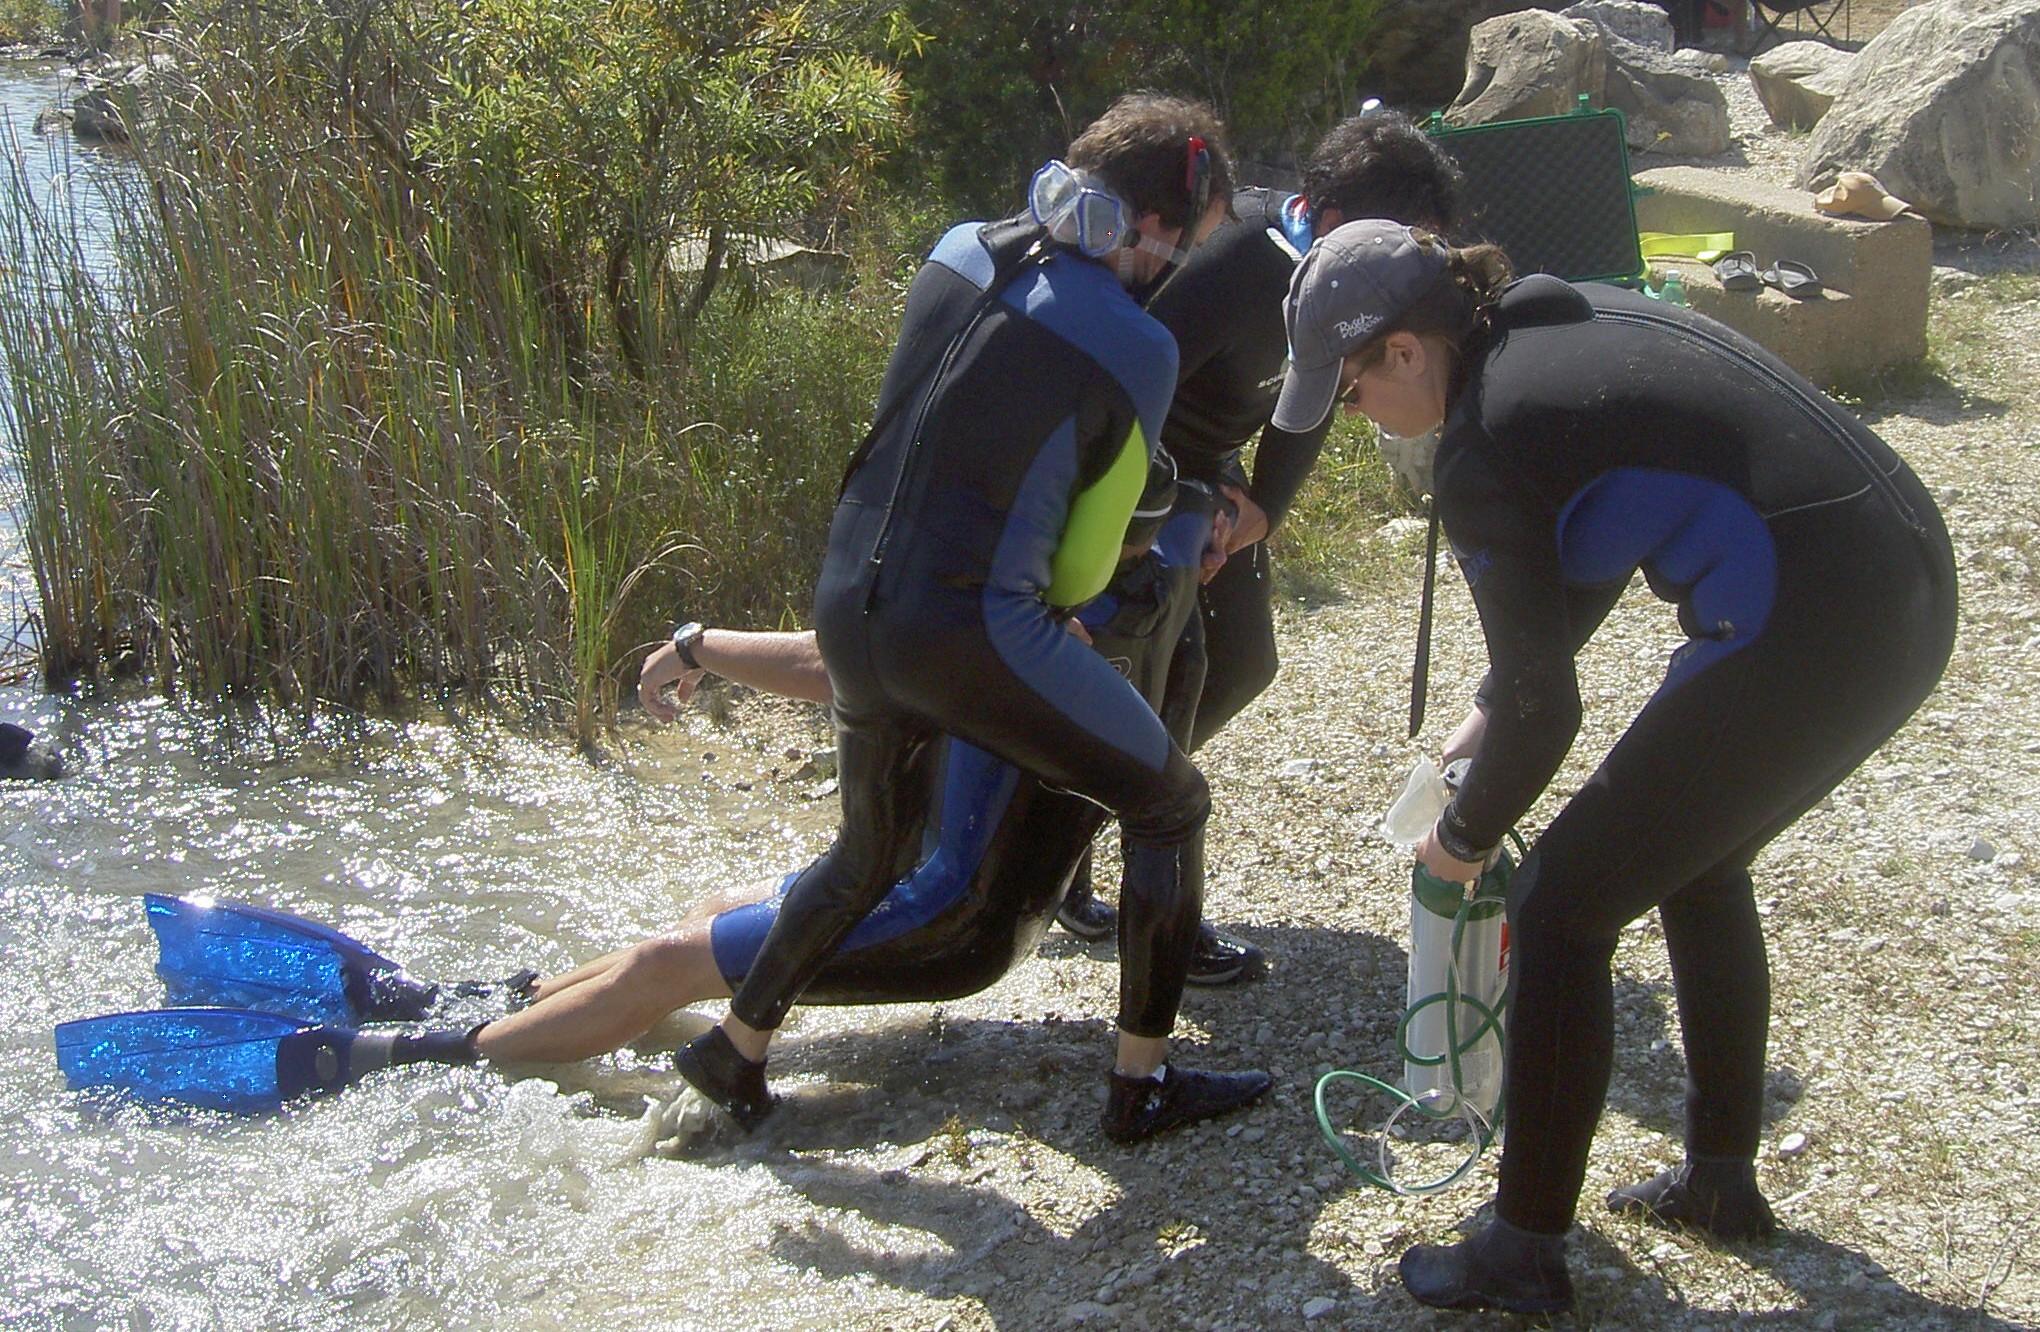 Alonissos, Alonnisos, Alonissos Triton Dive, Rescue Diver